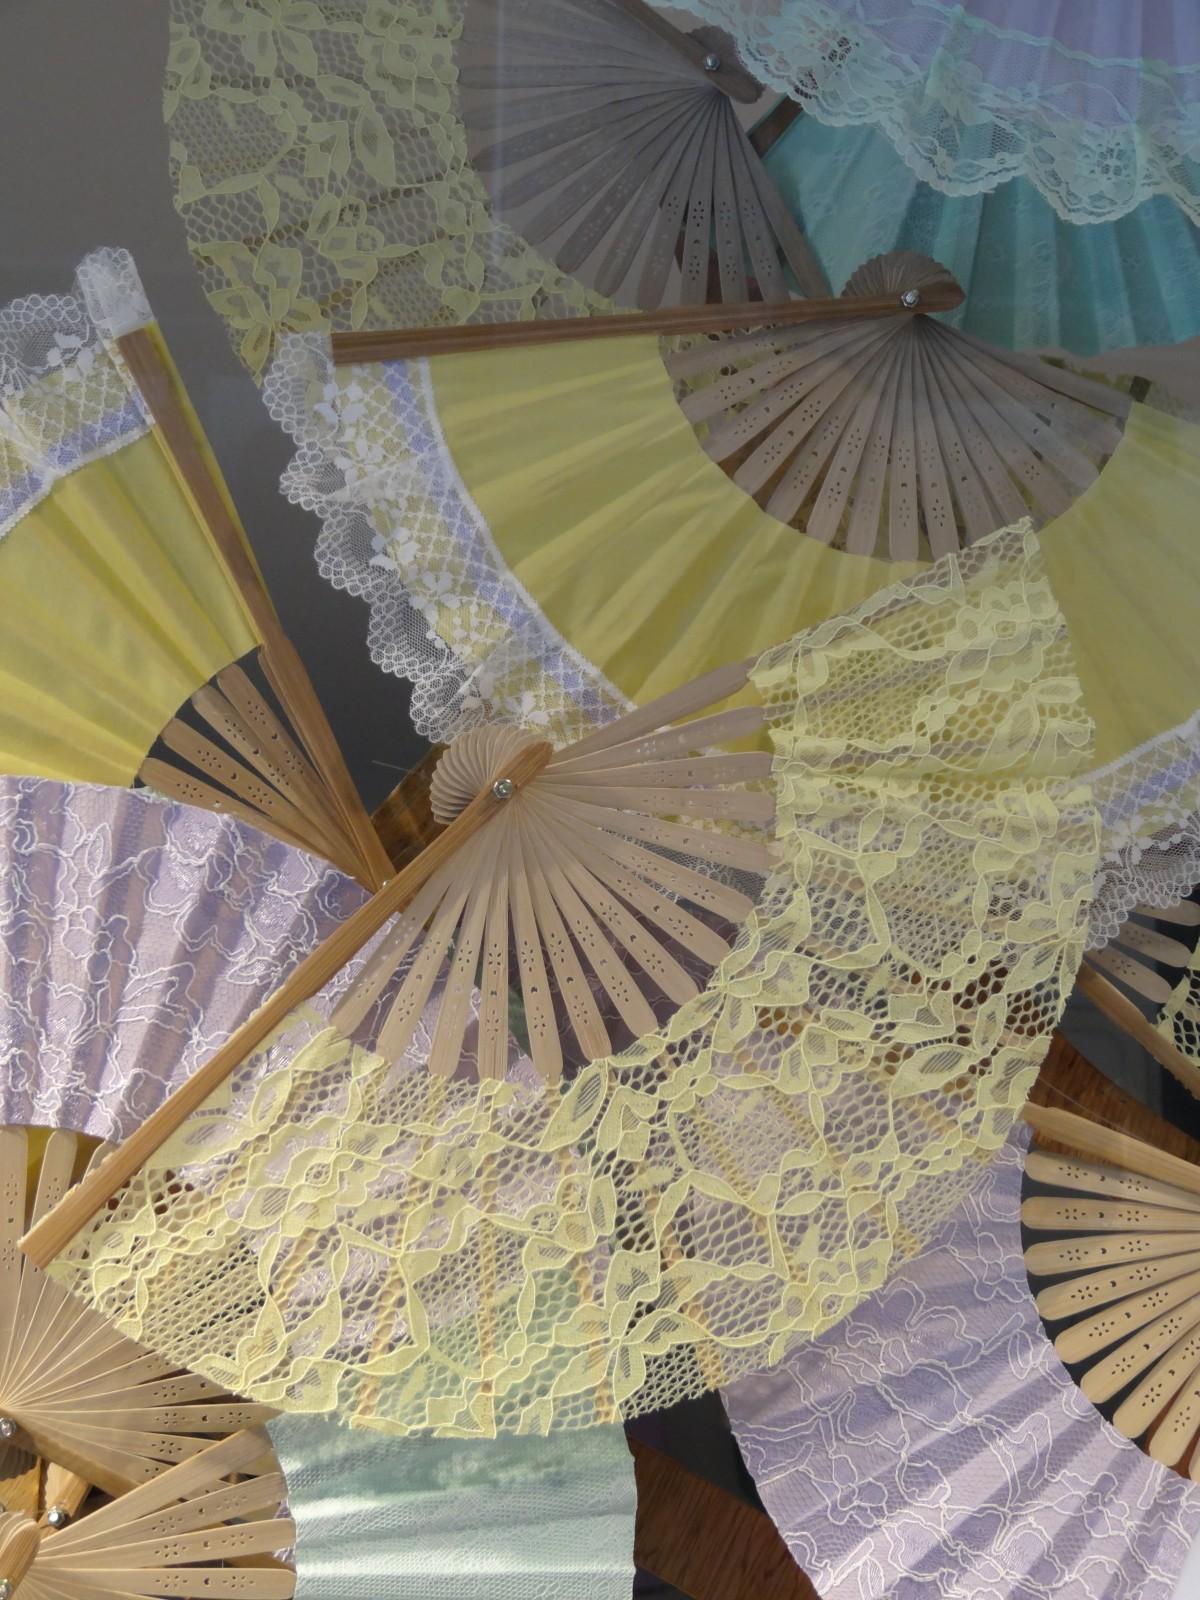 Free Images Ceiling Umbrella China Wind Plum Bamboo